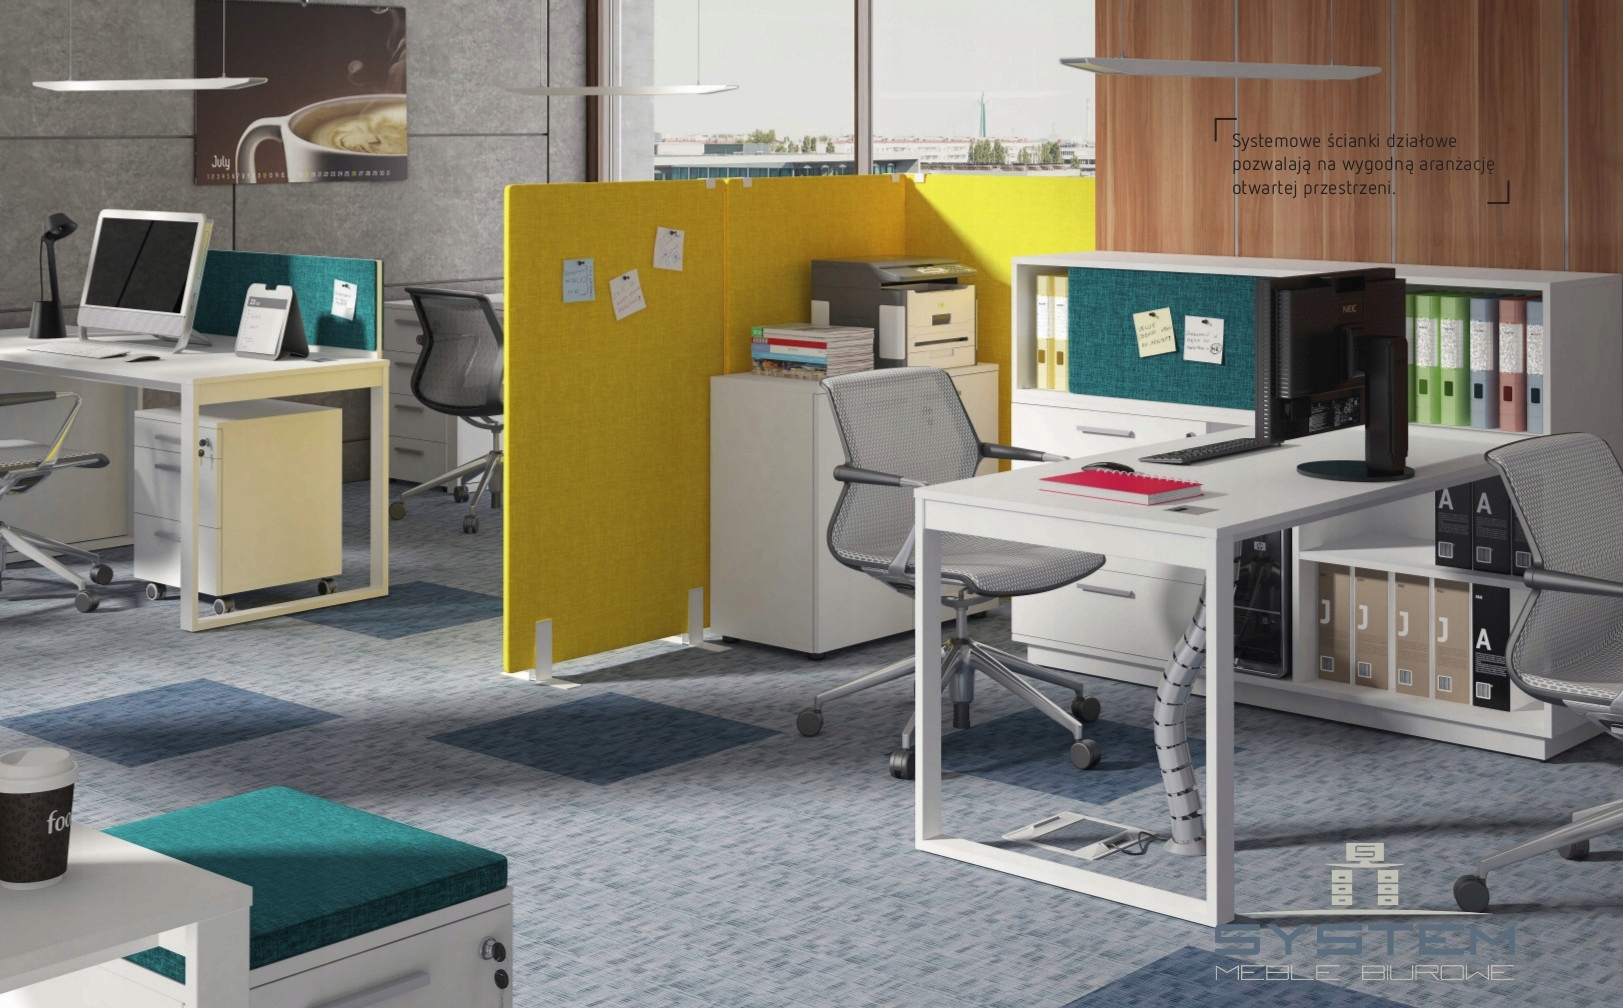 Bardzo dobryFantastyczny Meble biurowe 4 stanowiska pracy Intelli -15% - 7515092304 KK77